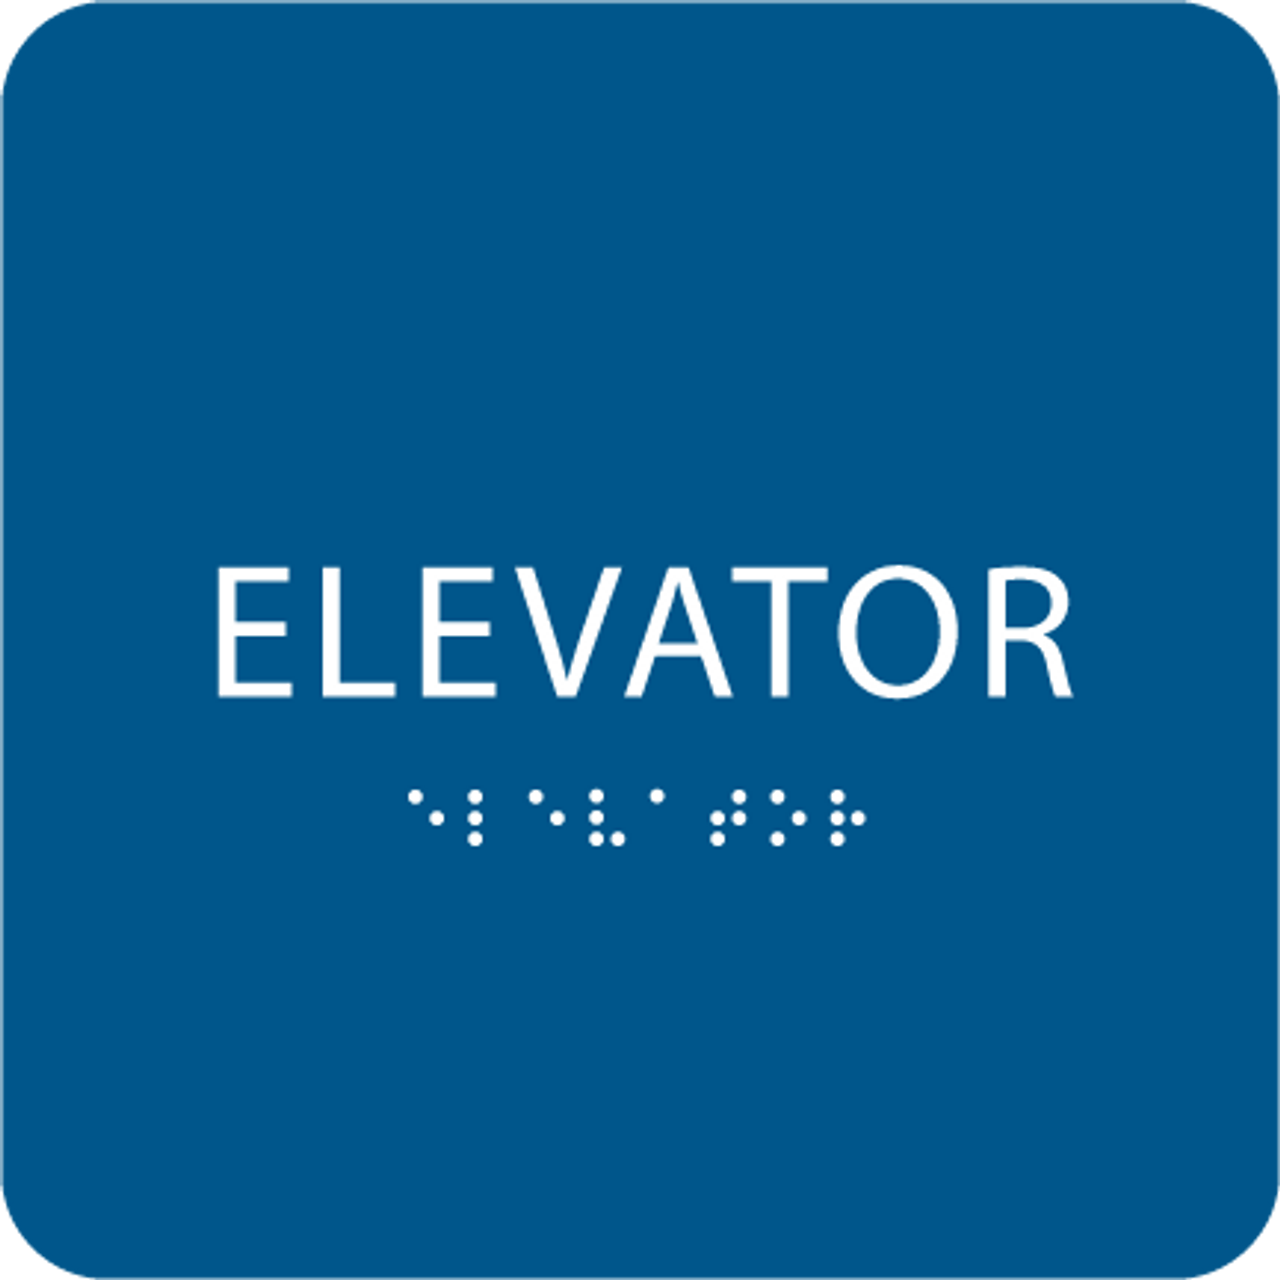 Royal ADA Elevator Sign